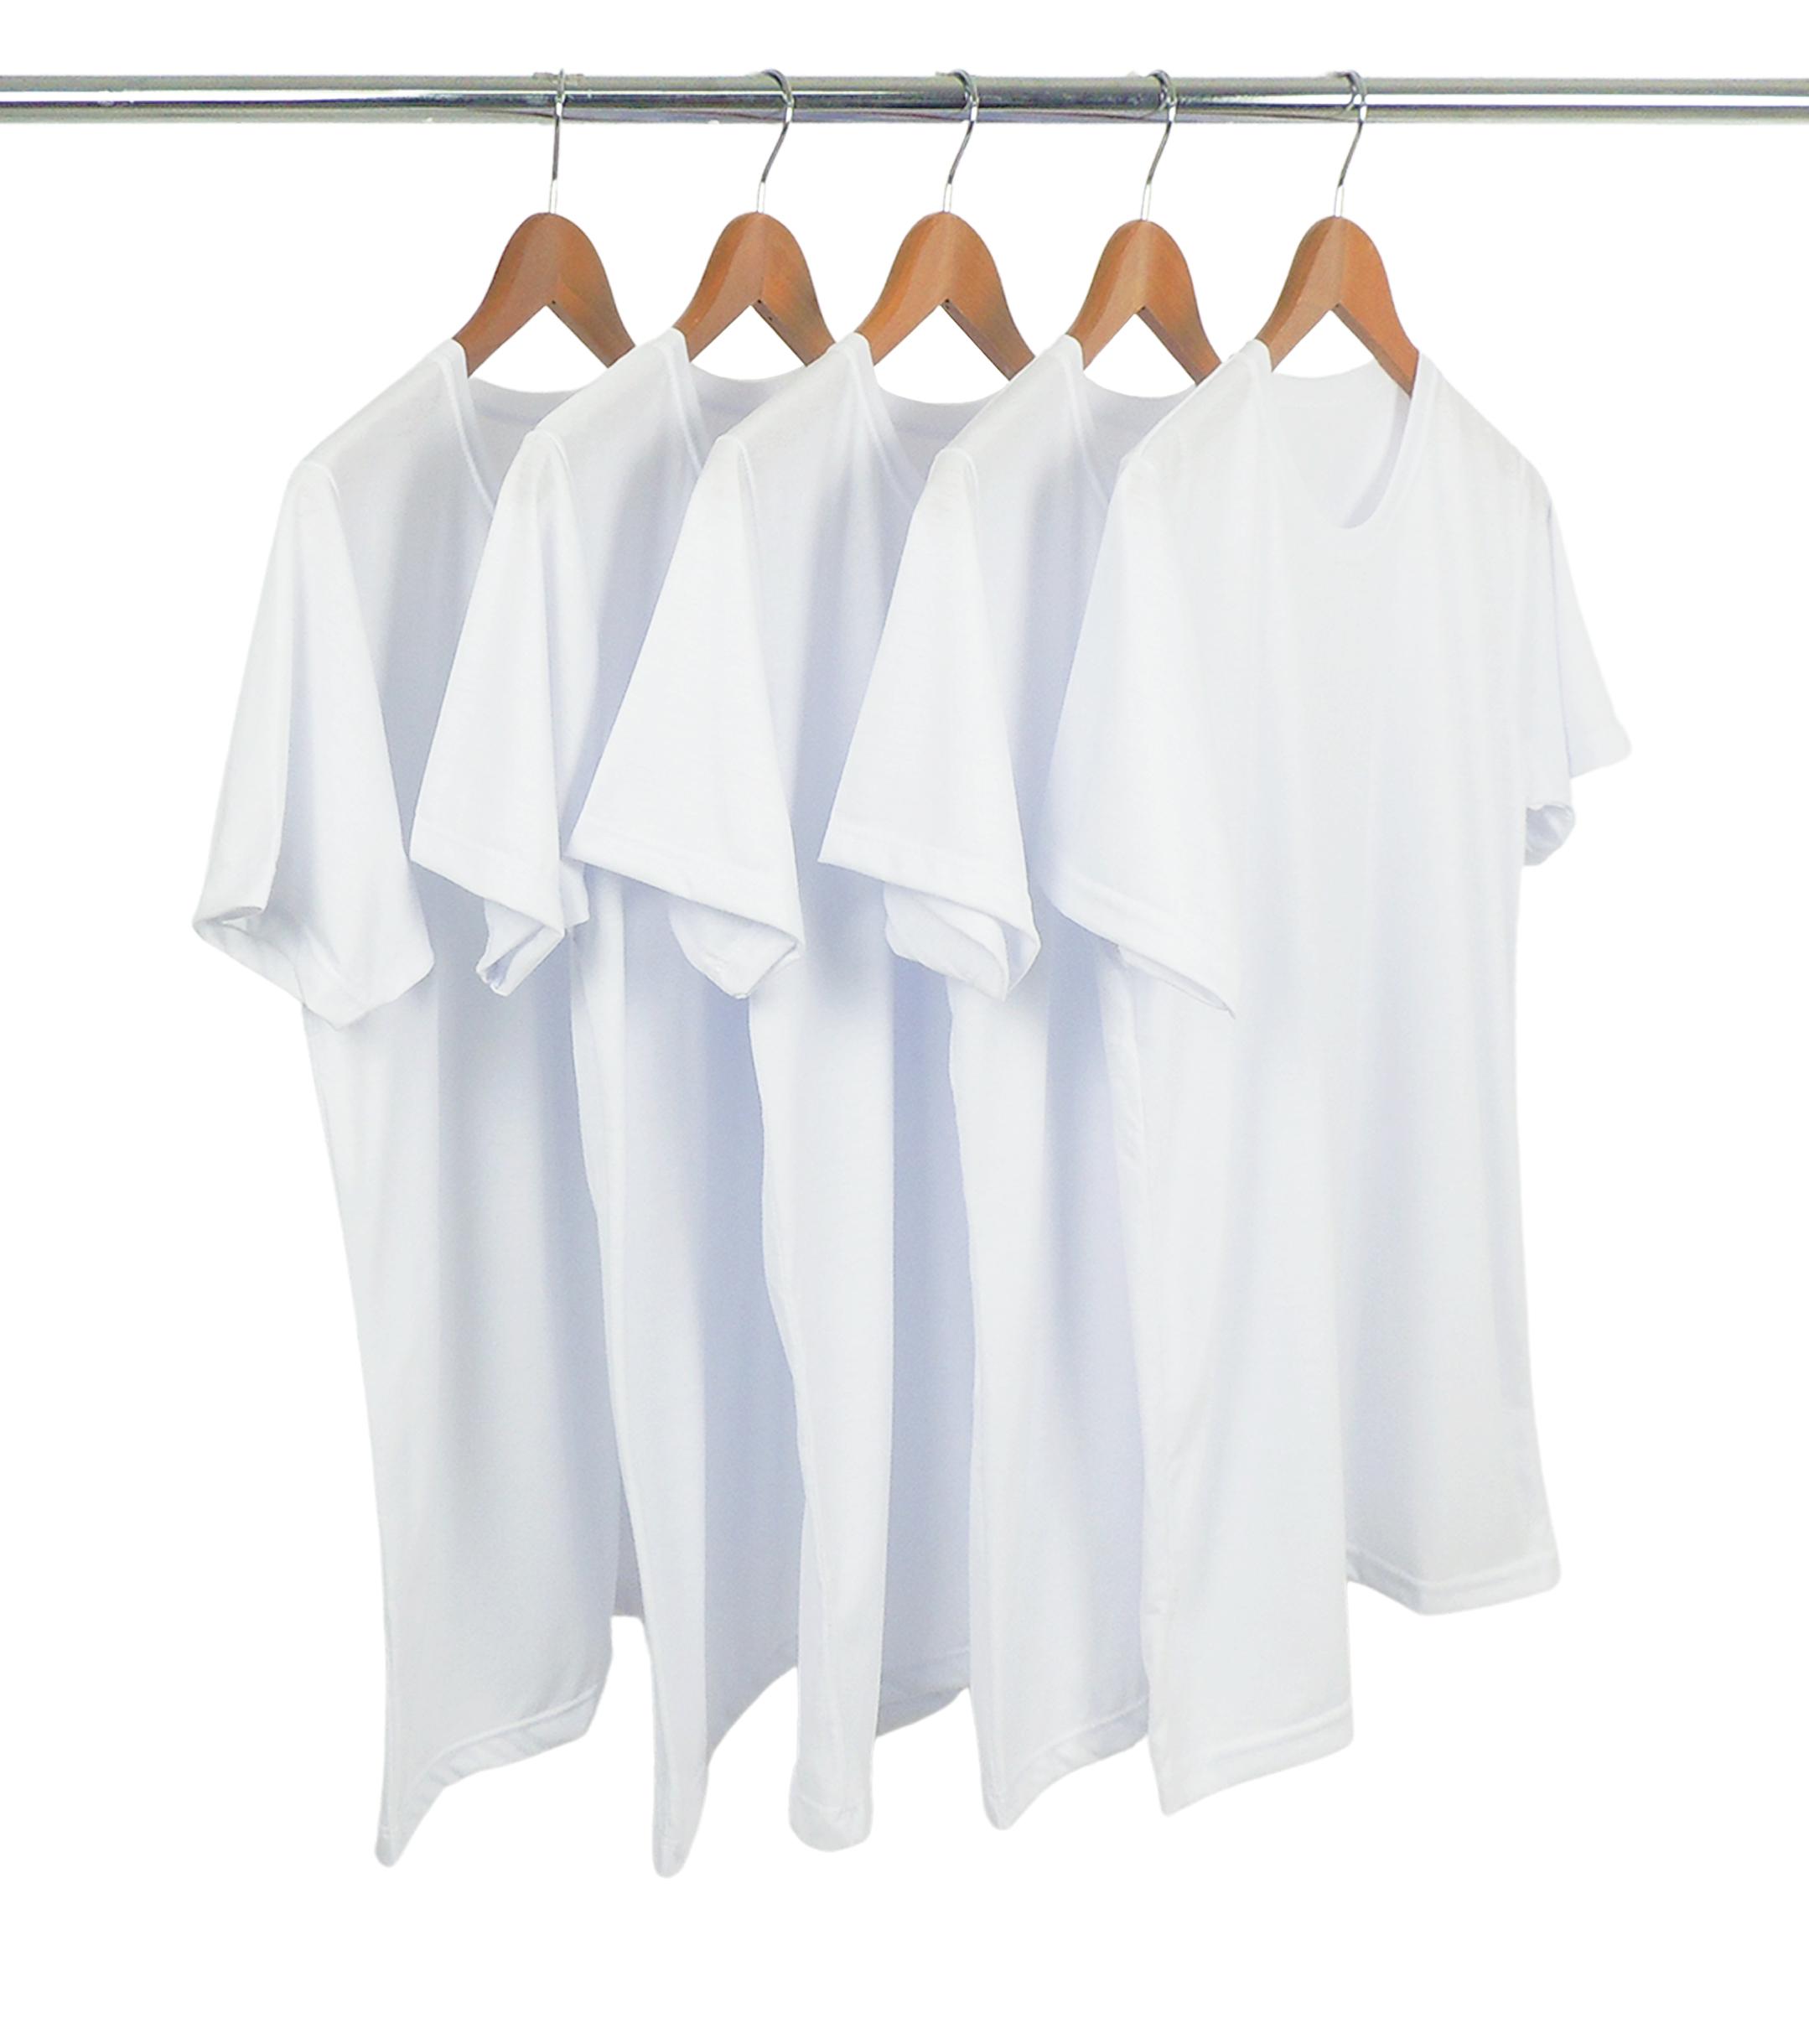 KIT 5 Camisetas de Poliéster/Sublimática Branca